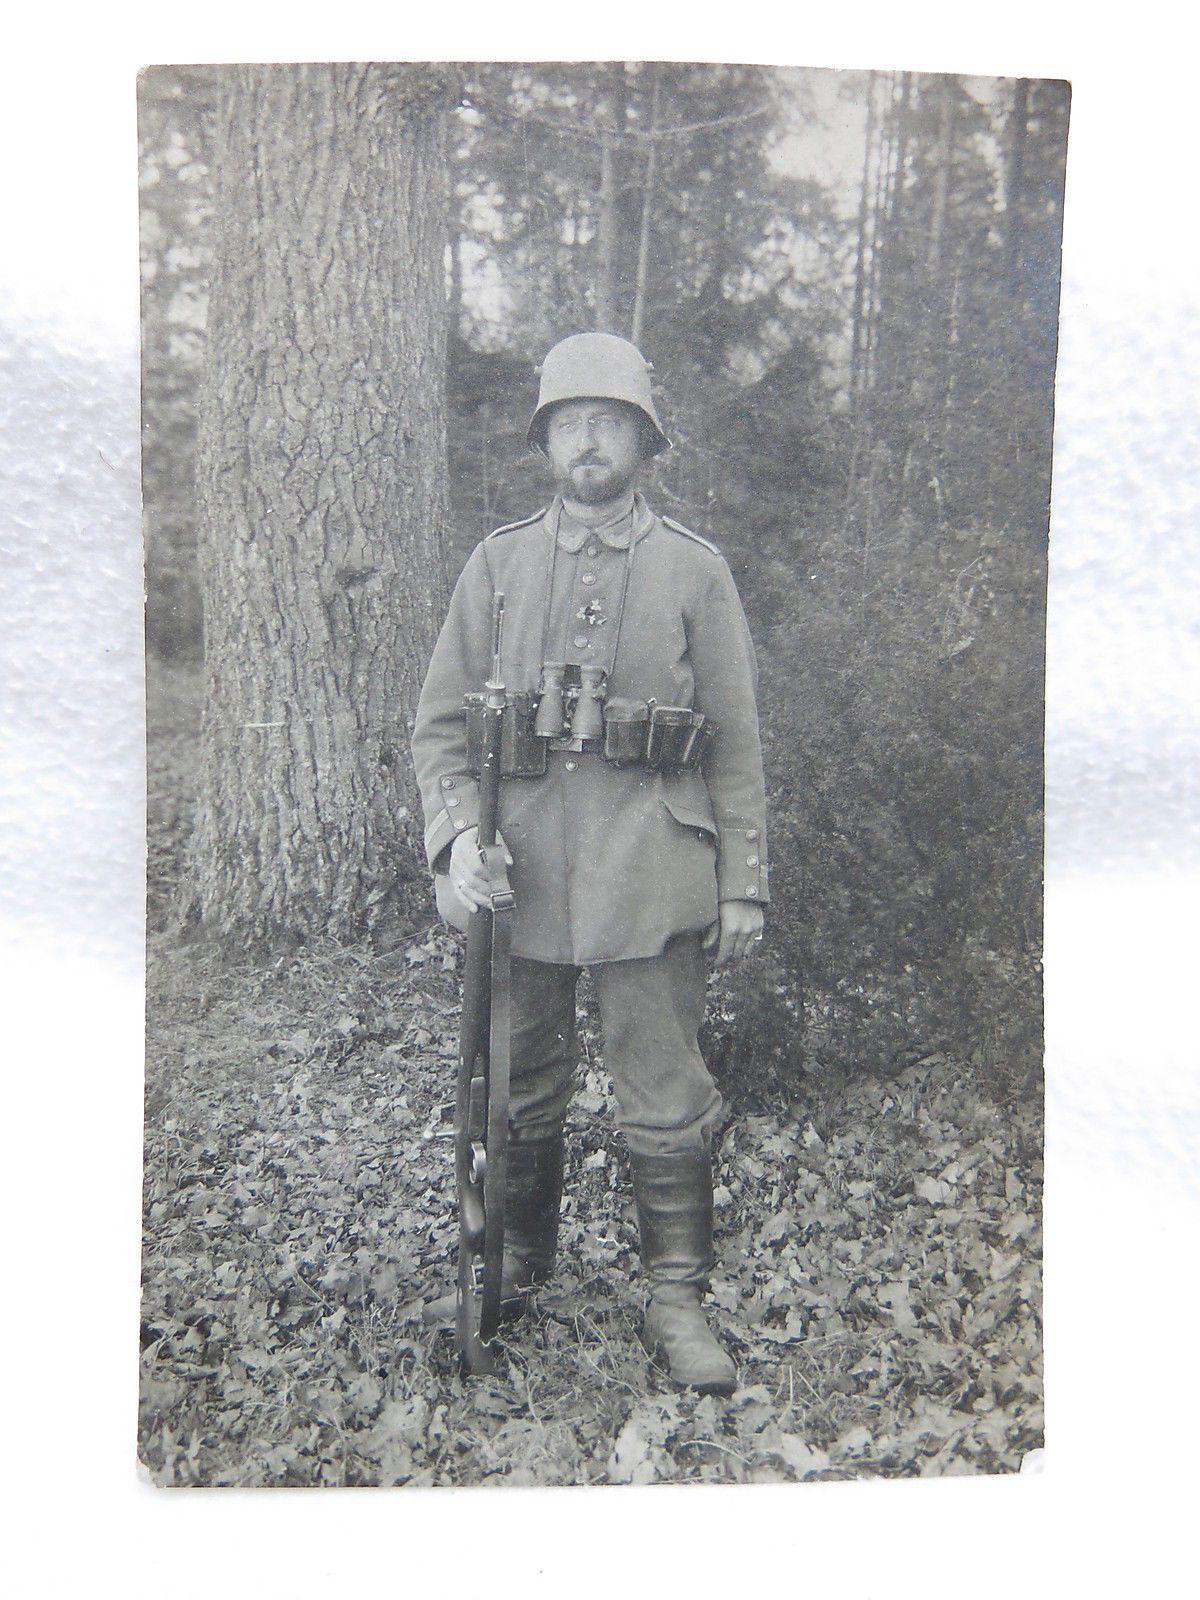 Wki Foto Preussen Soldatenportrait Feldgrau Stahlhelm Dienstglas Soldat Helm Portrait